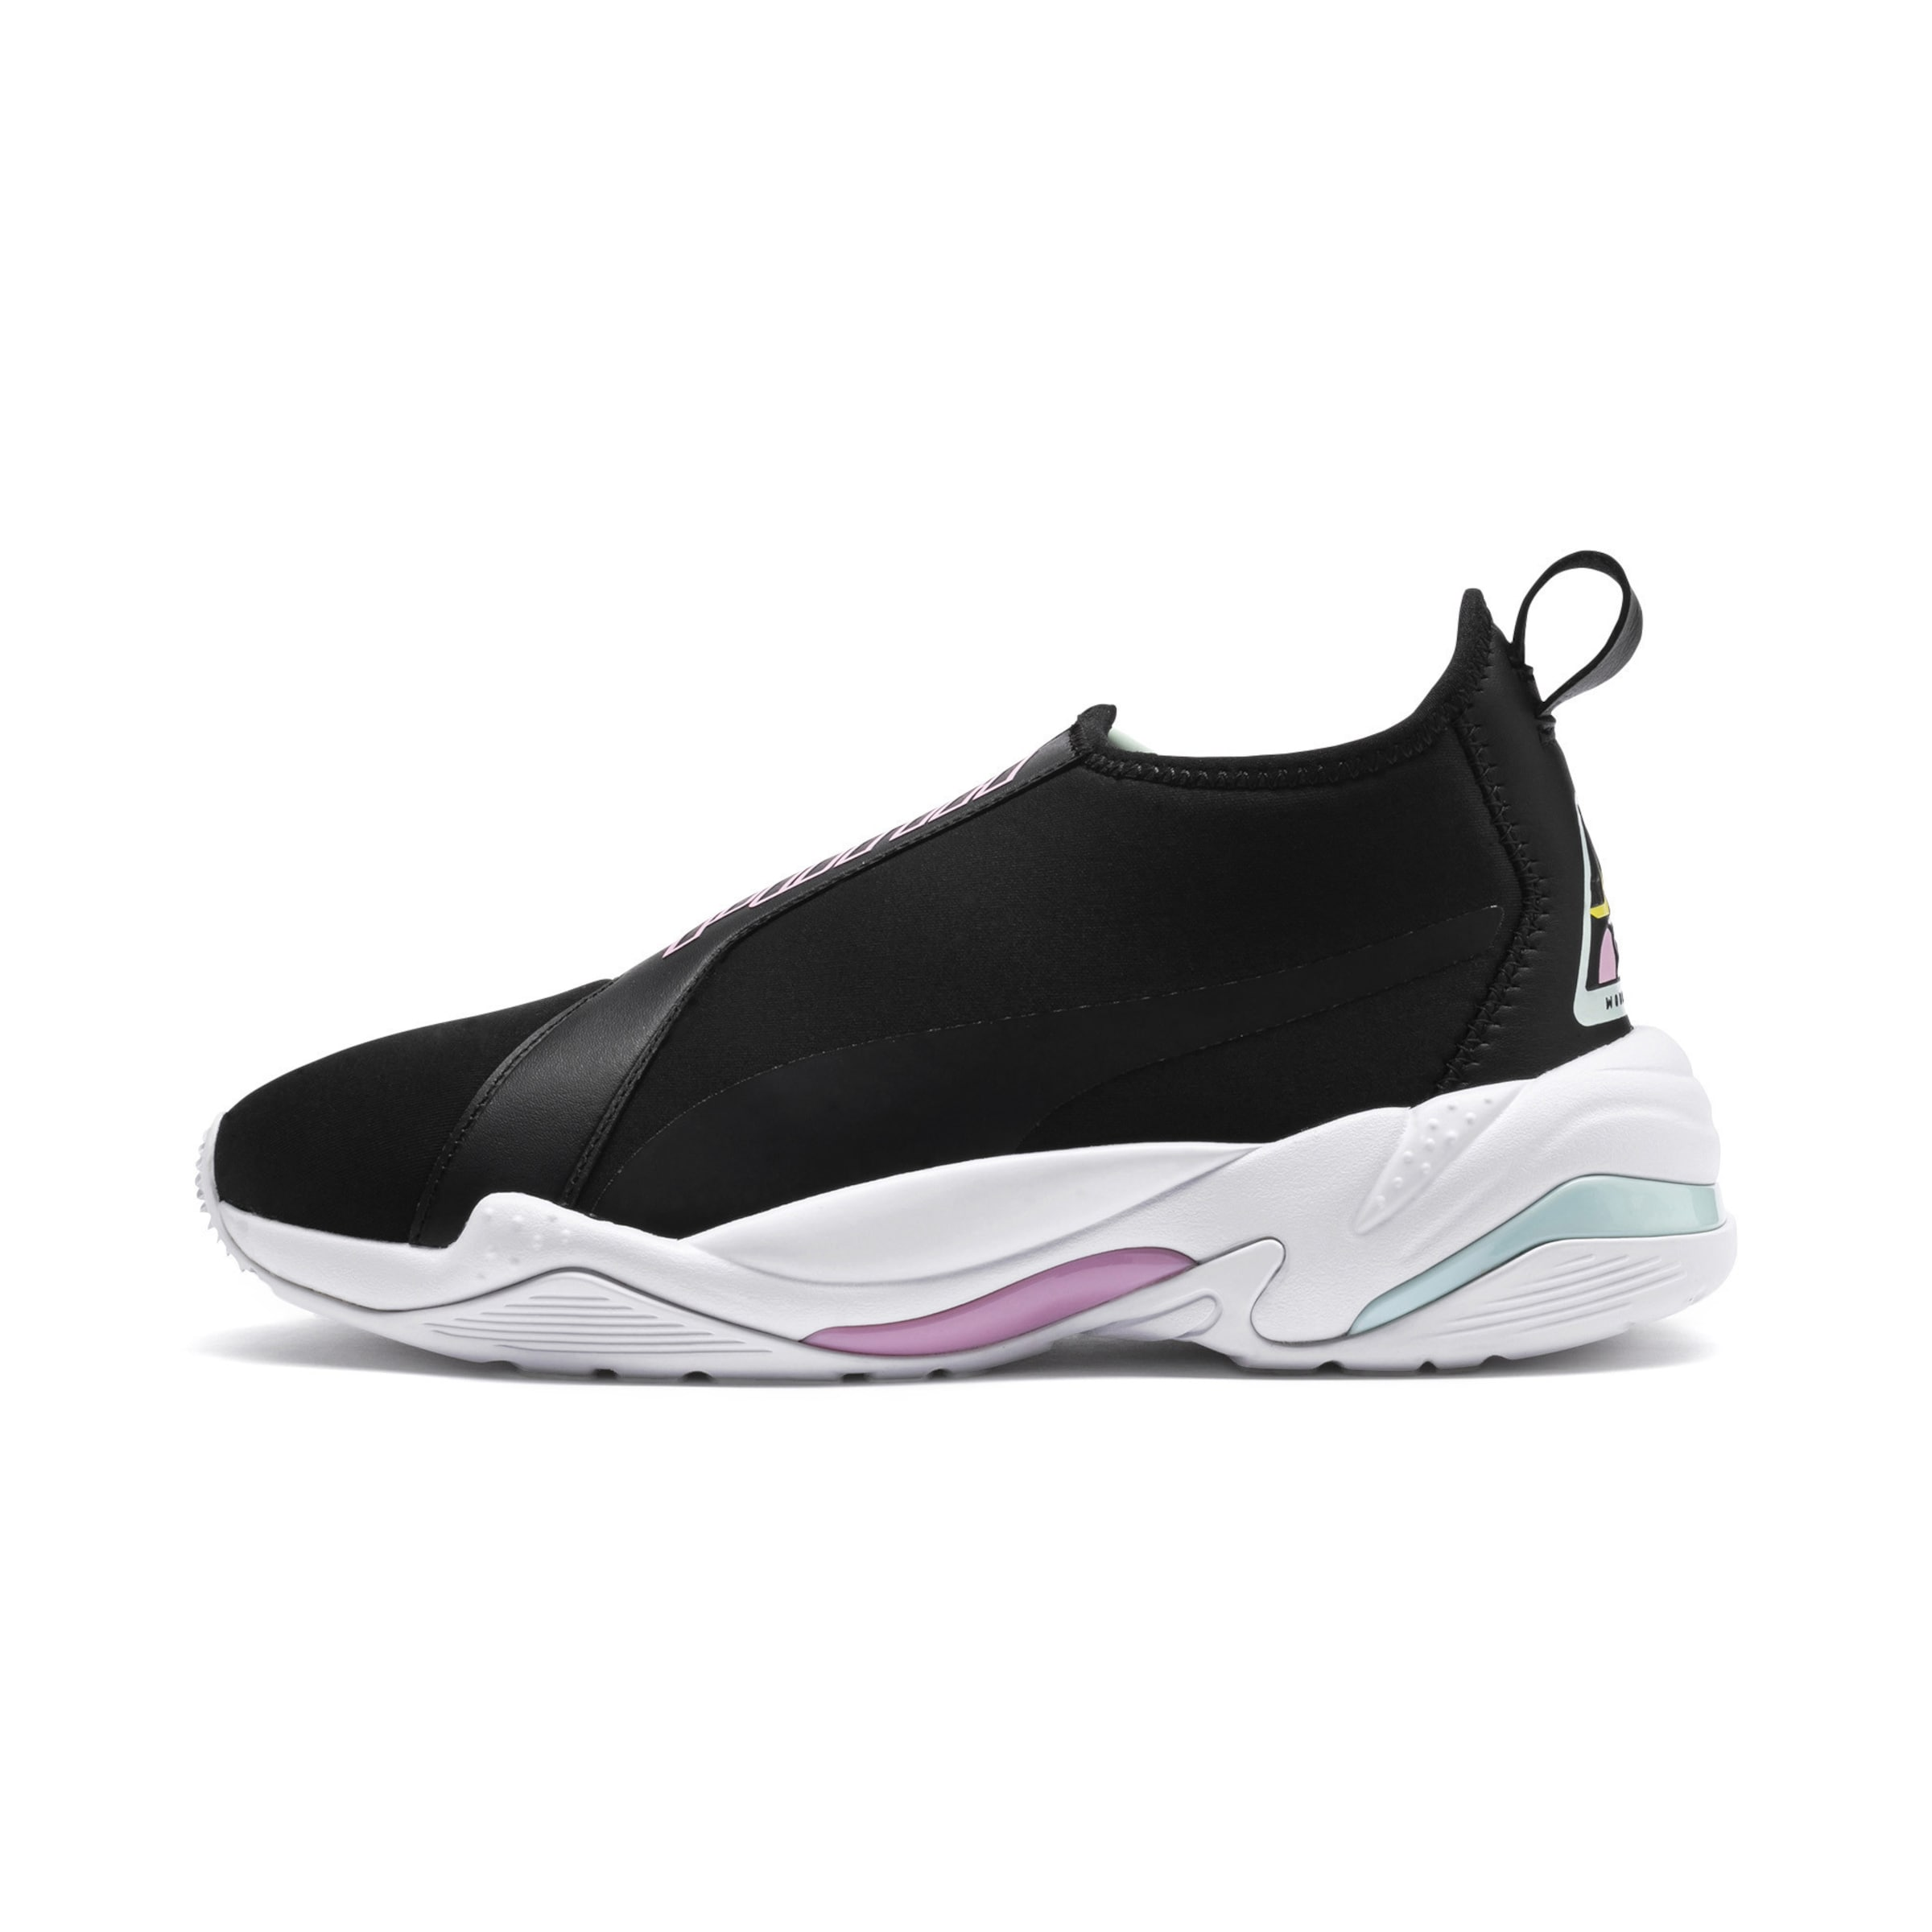 In Sneaker Tz' 'thunder Schwarz Puma MintRosa JlKcFT1